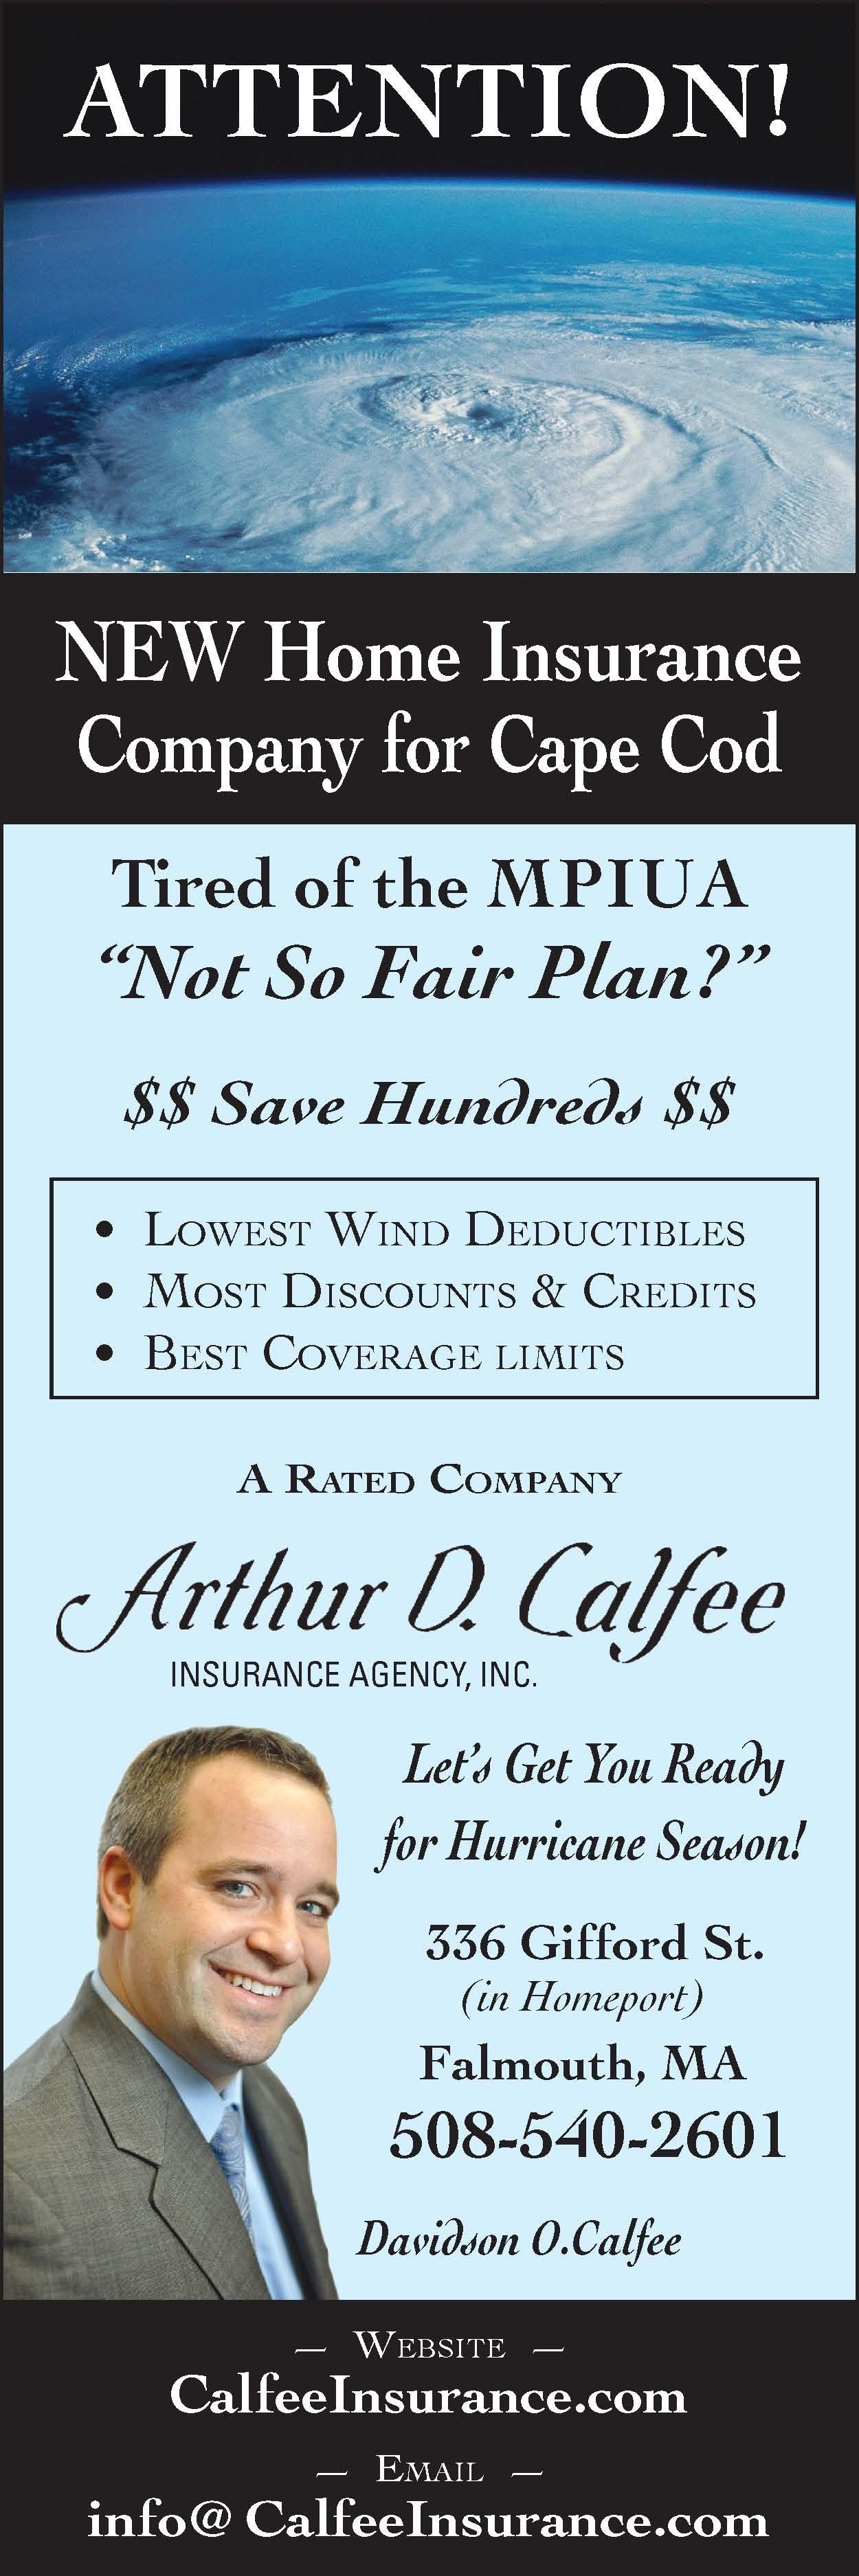 massachusetts property insurance underwriting association payment